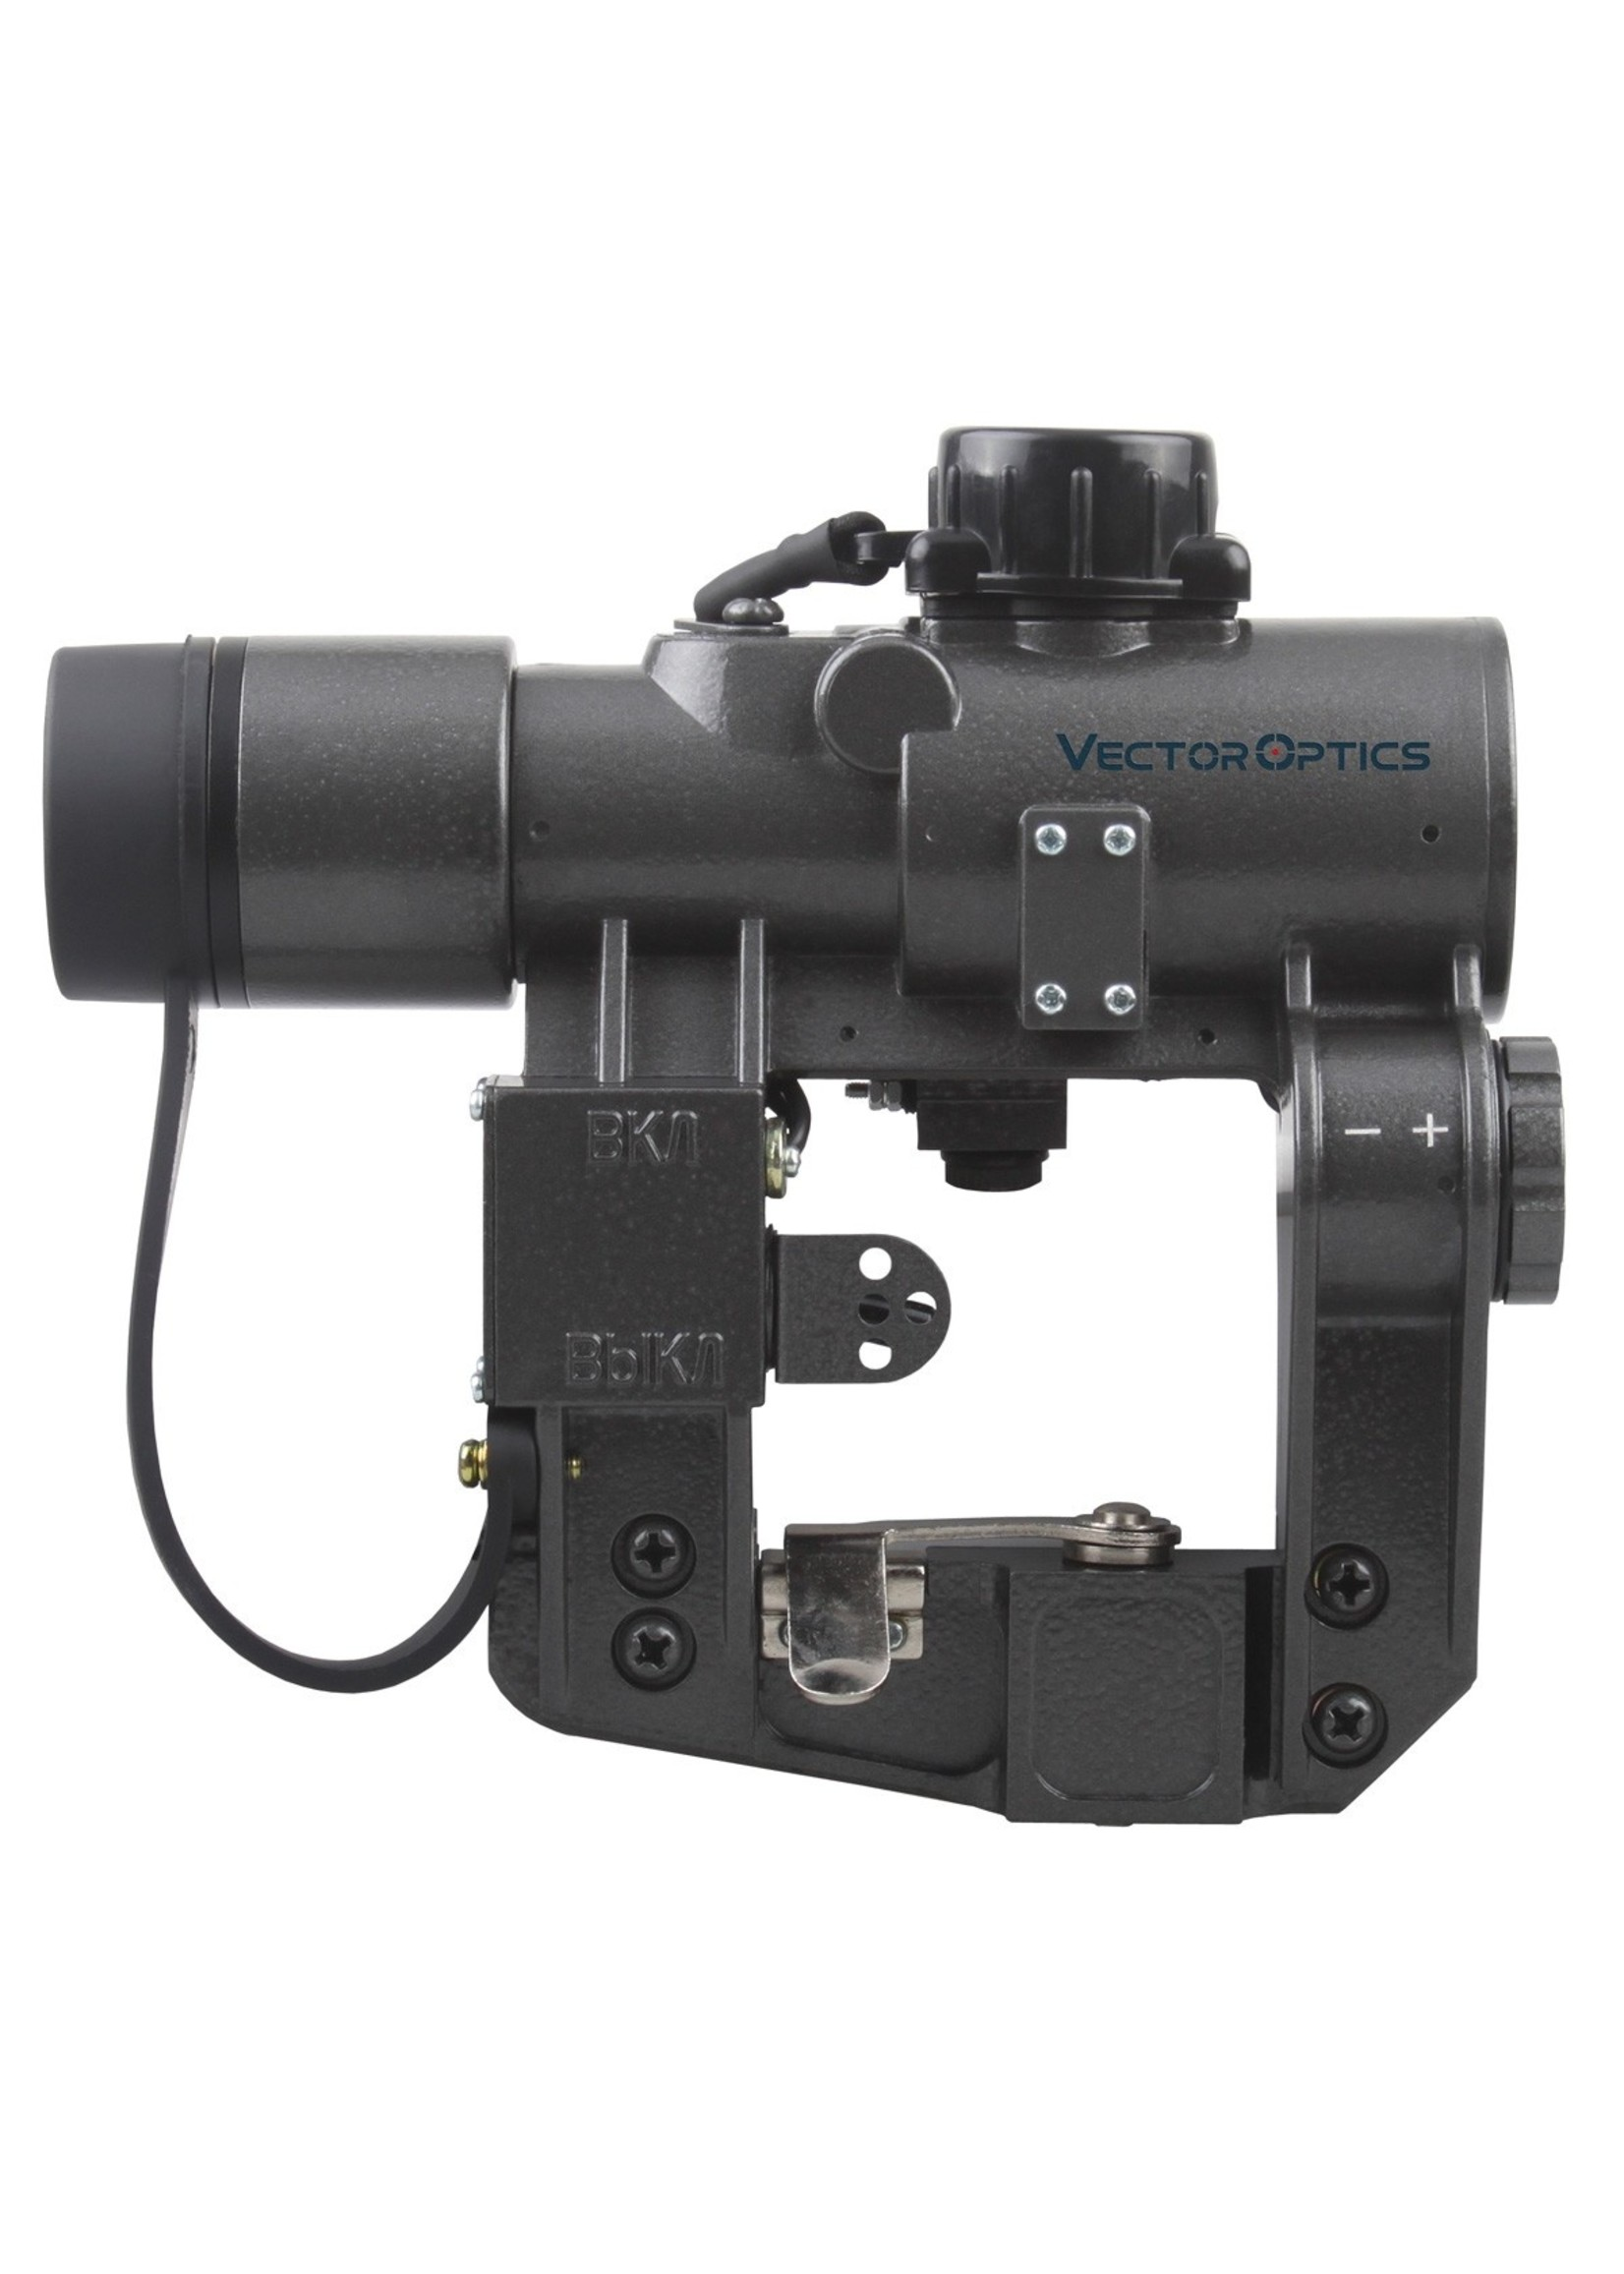 Vector Optics Vector Optics PSO RED DOT 1X28